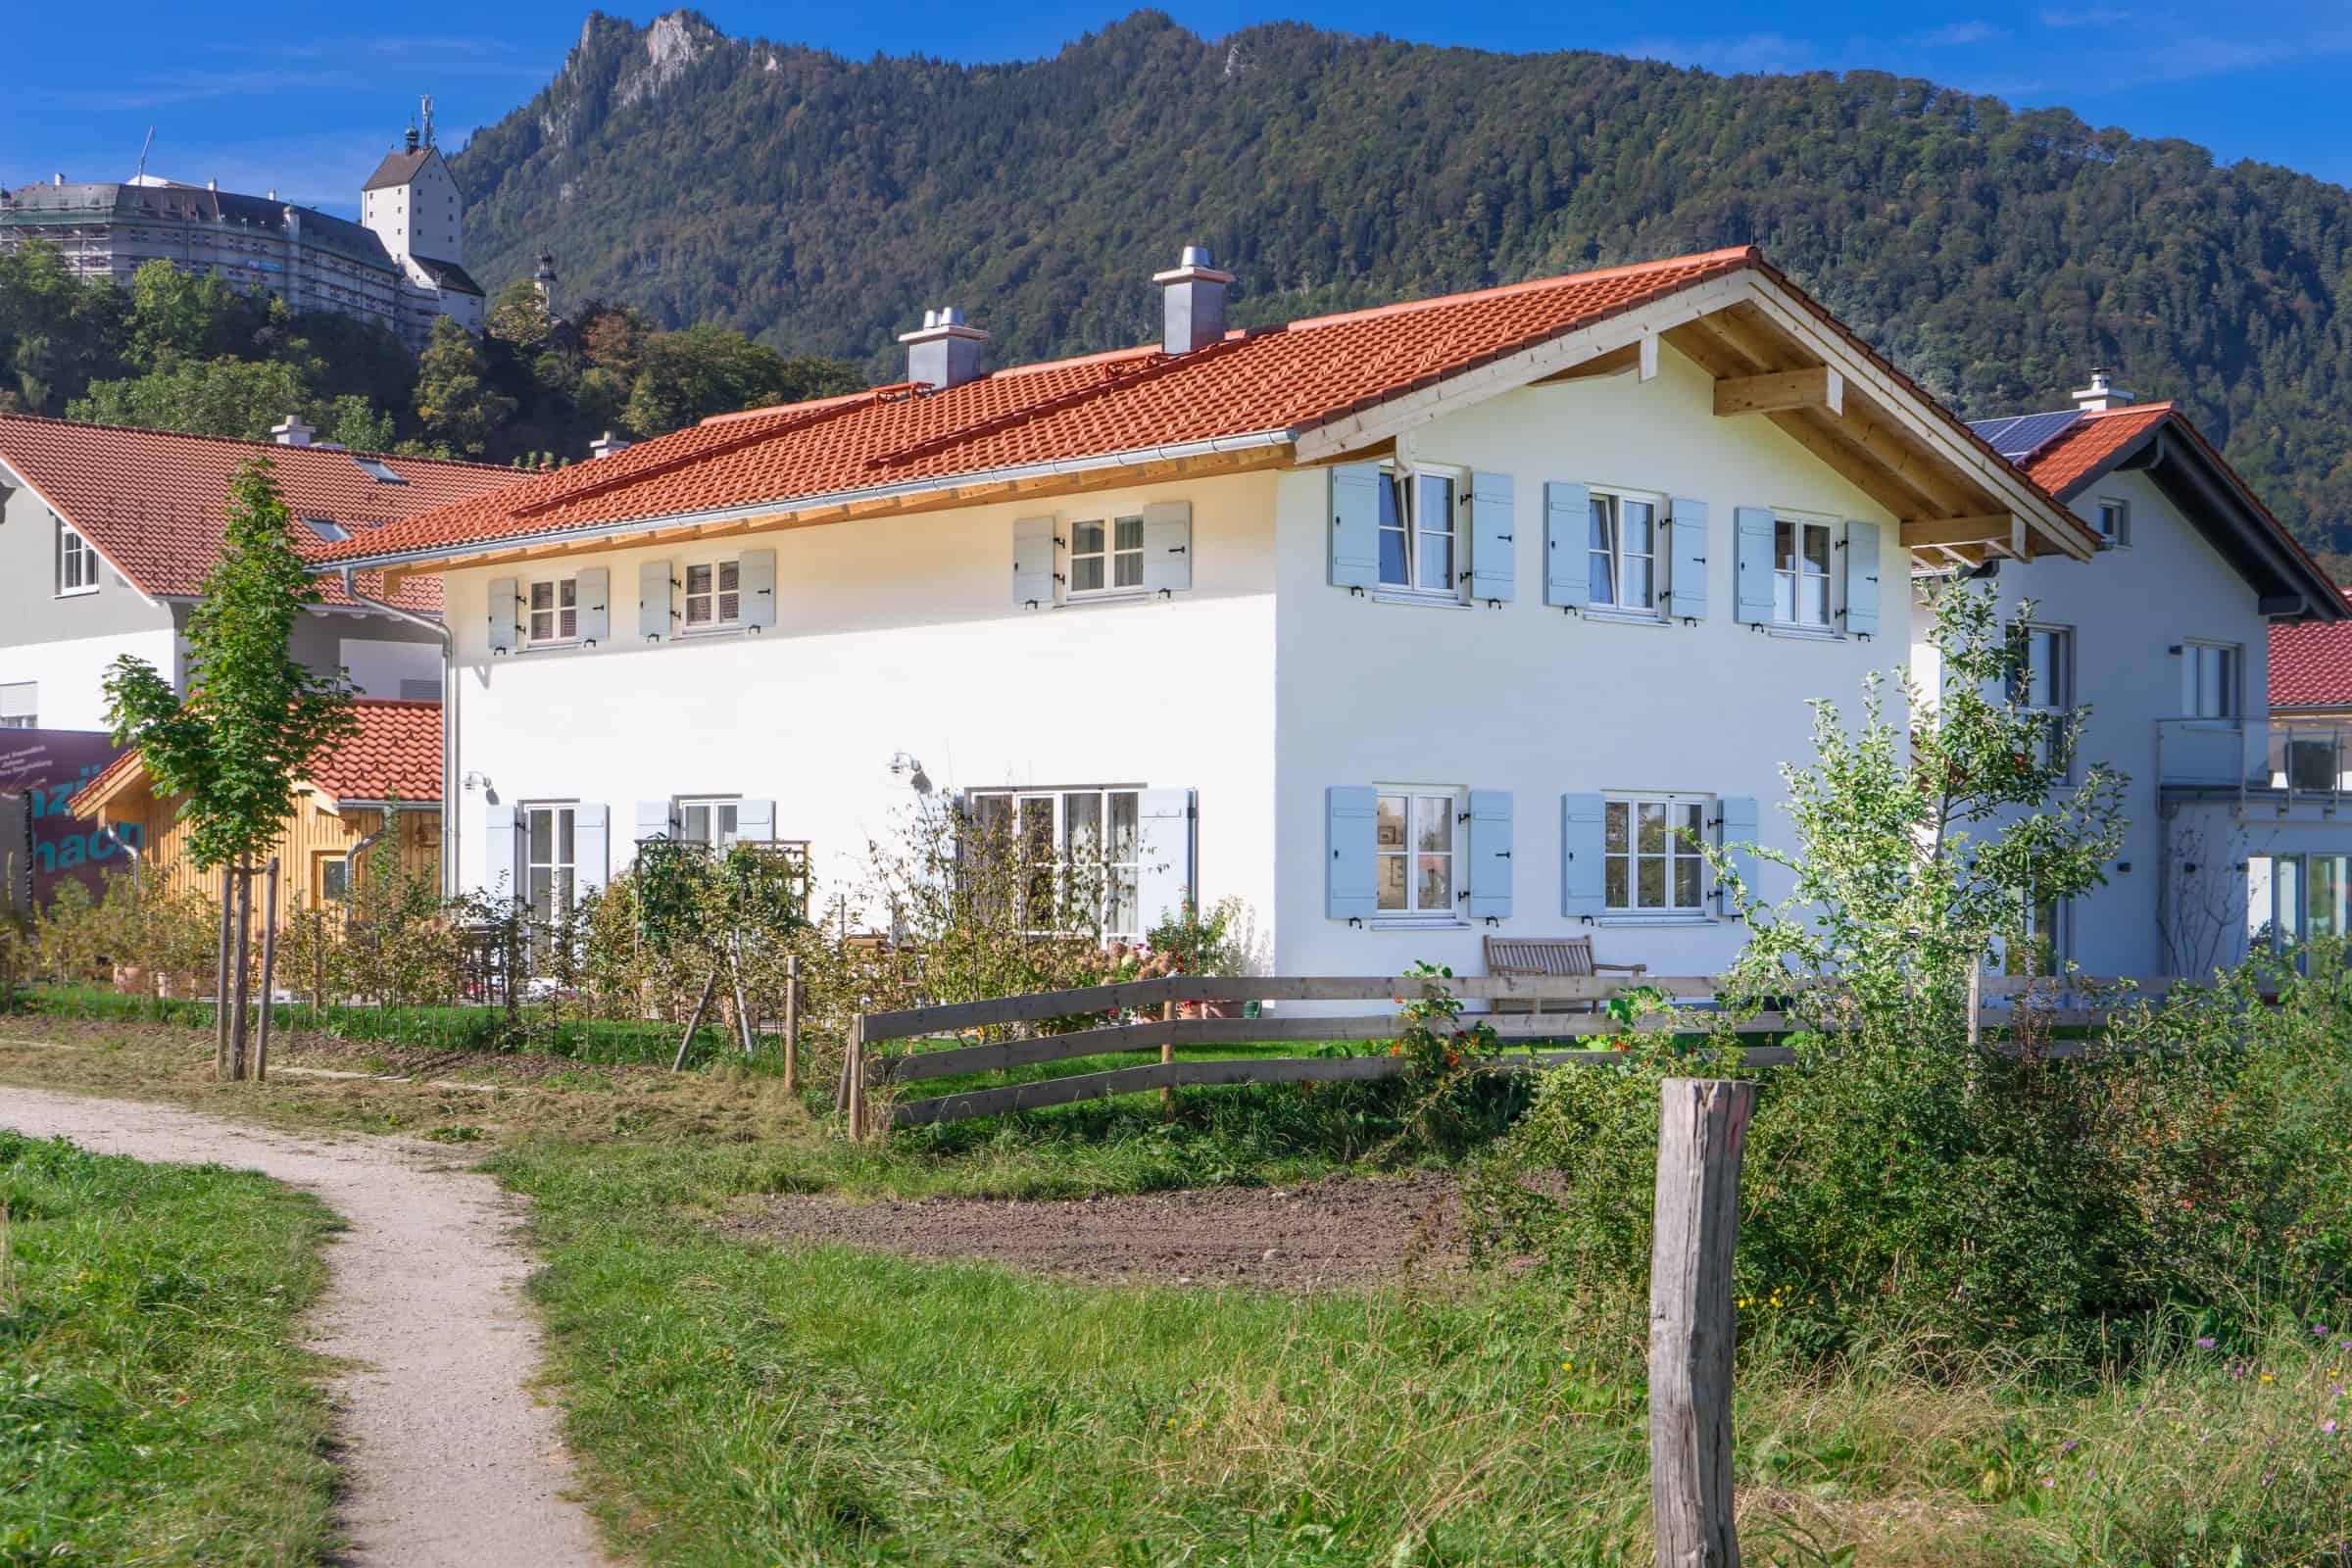 Hausbau in Aschau